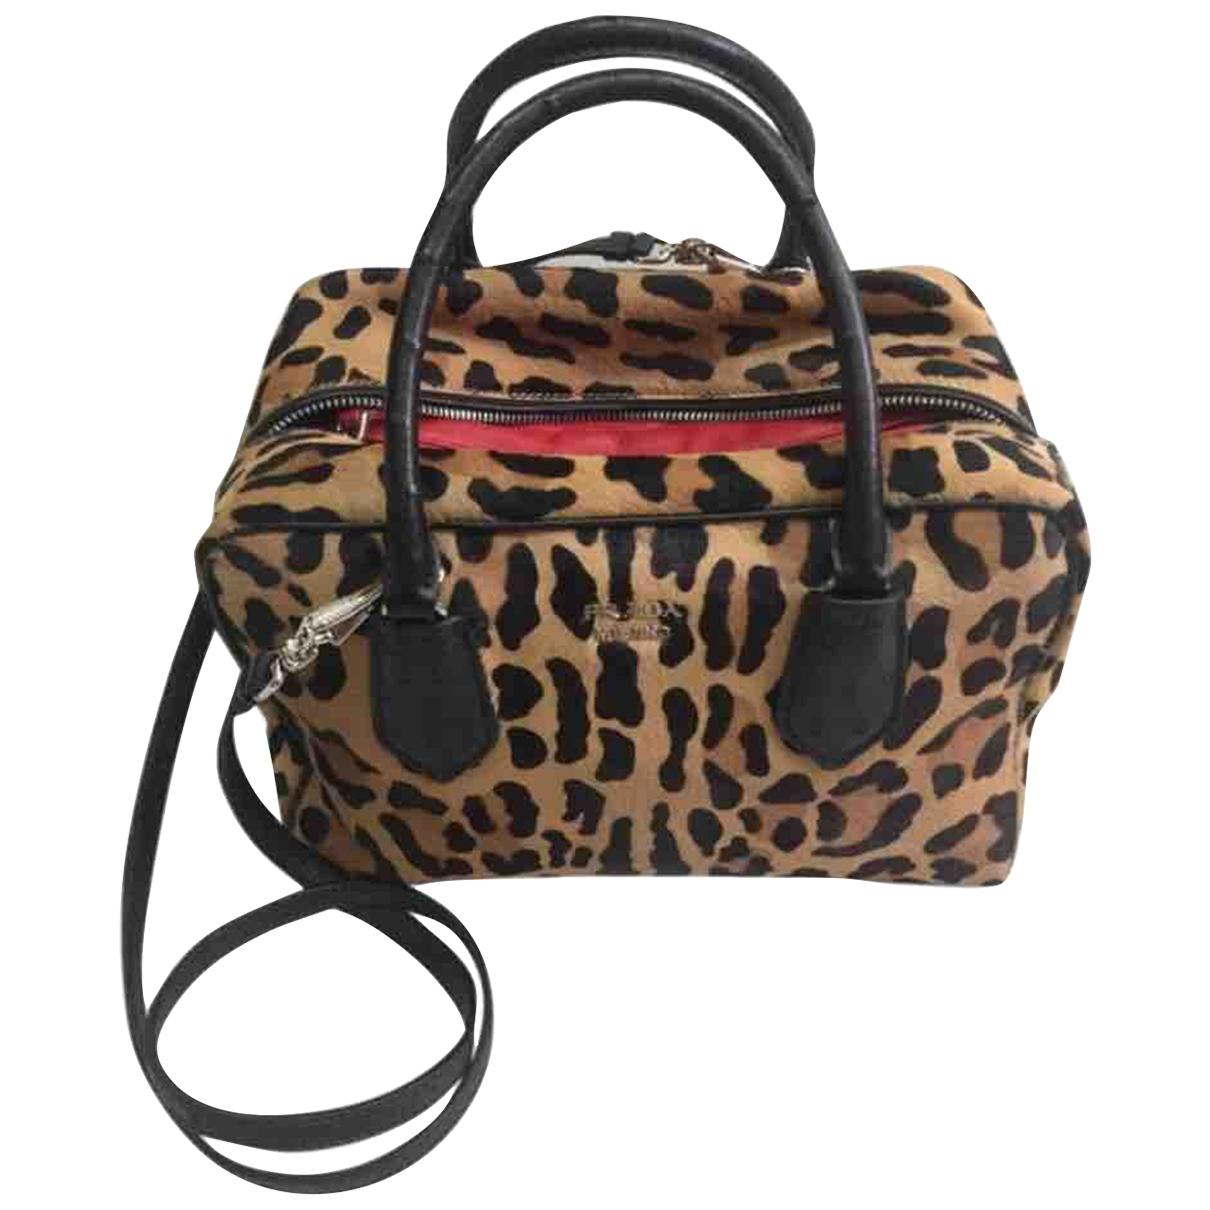 Prada \N Beige Pony-style calfskin handbag for Women \N